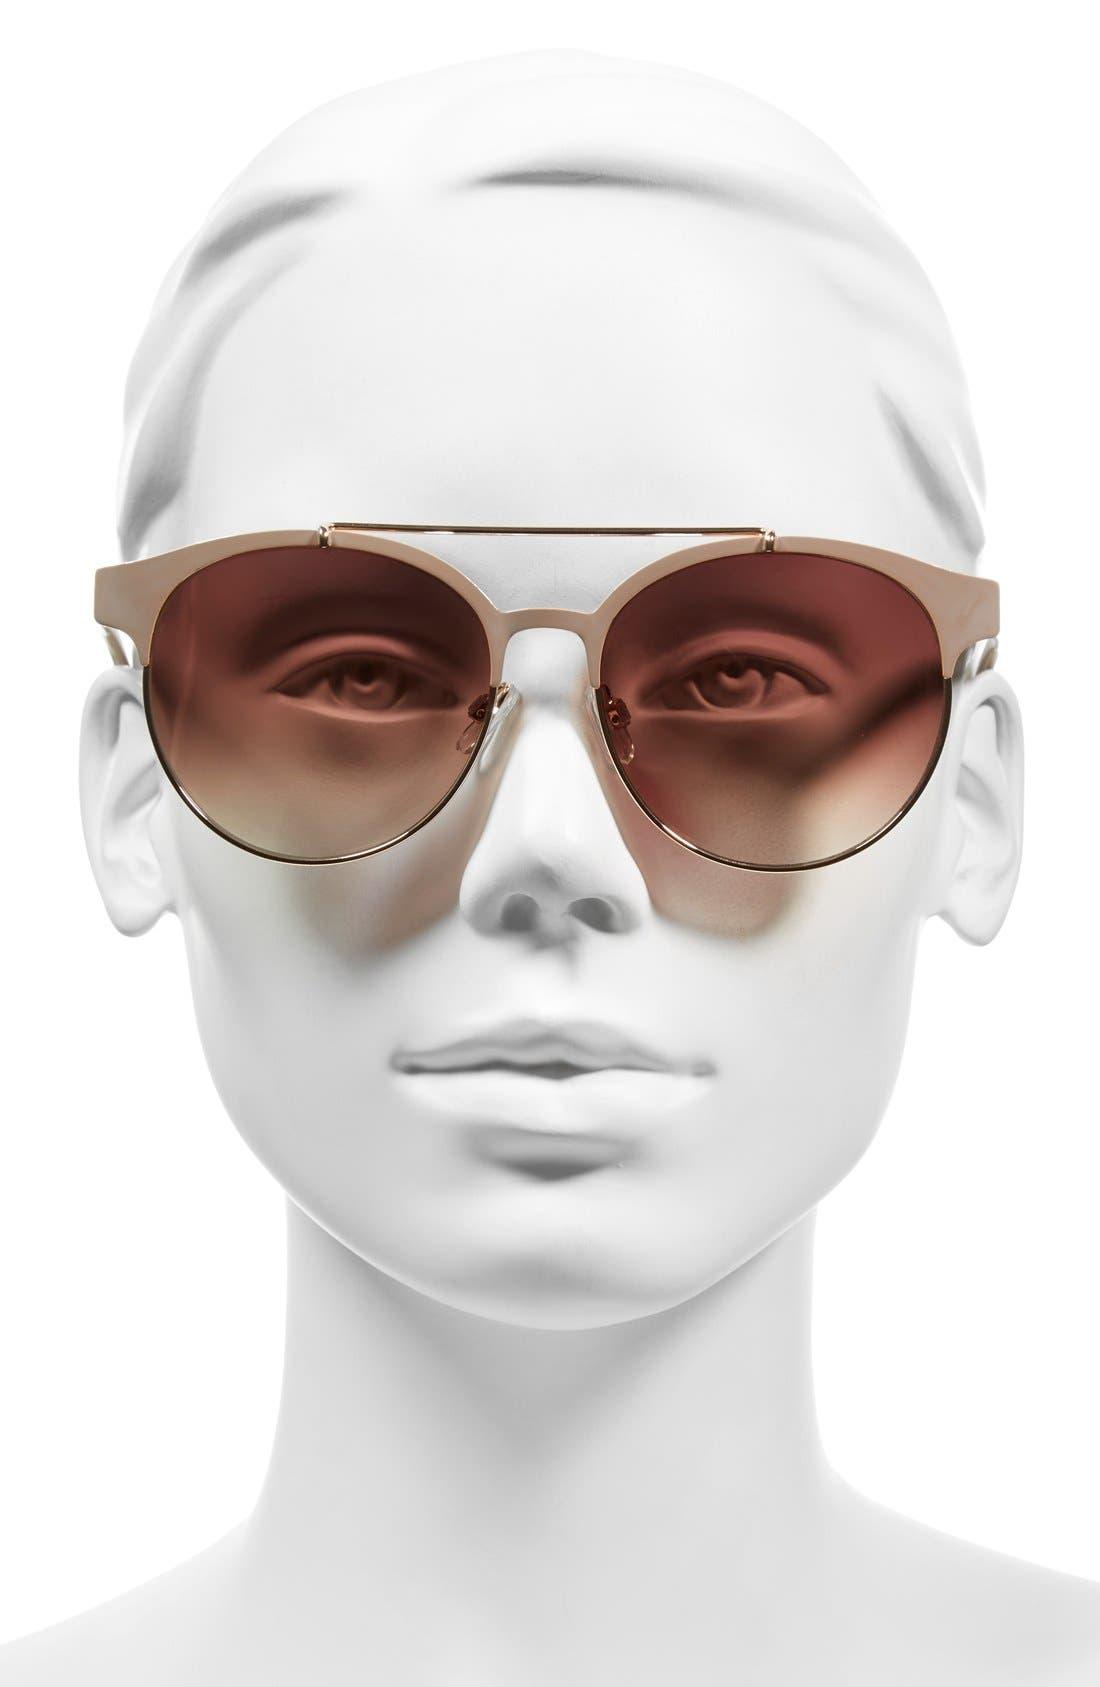 55mm Round Sunglasses,                             Alternate thumbnail 6, color,